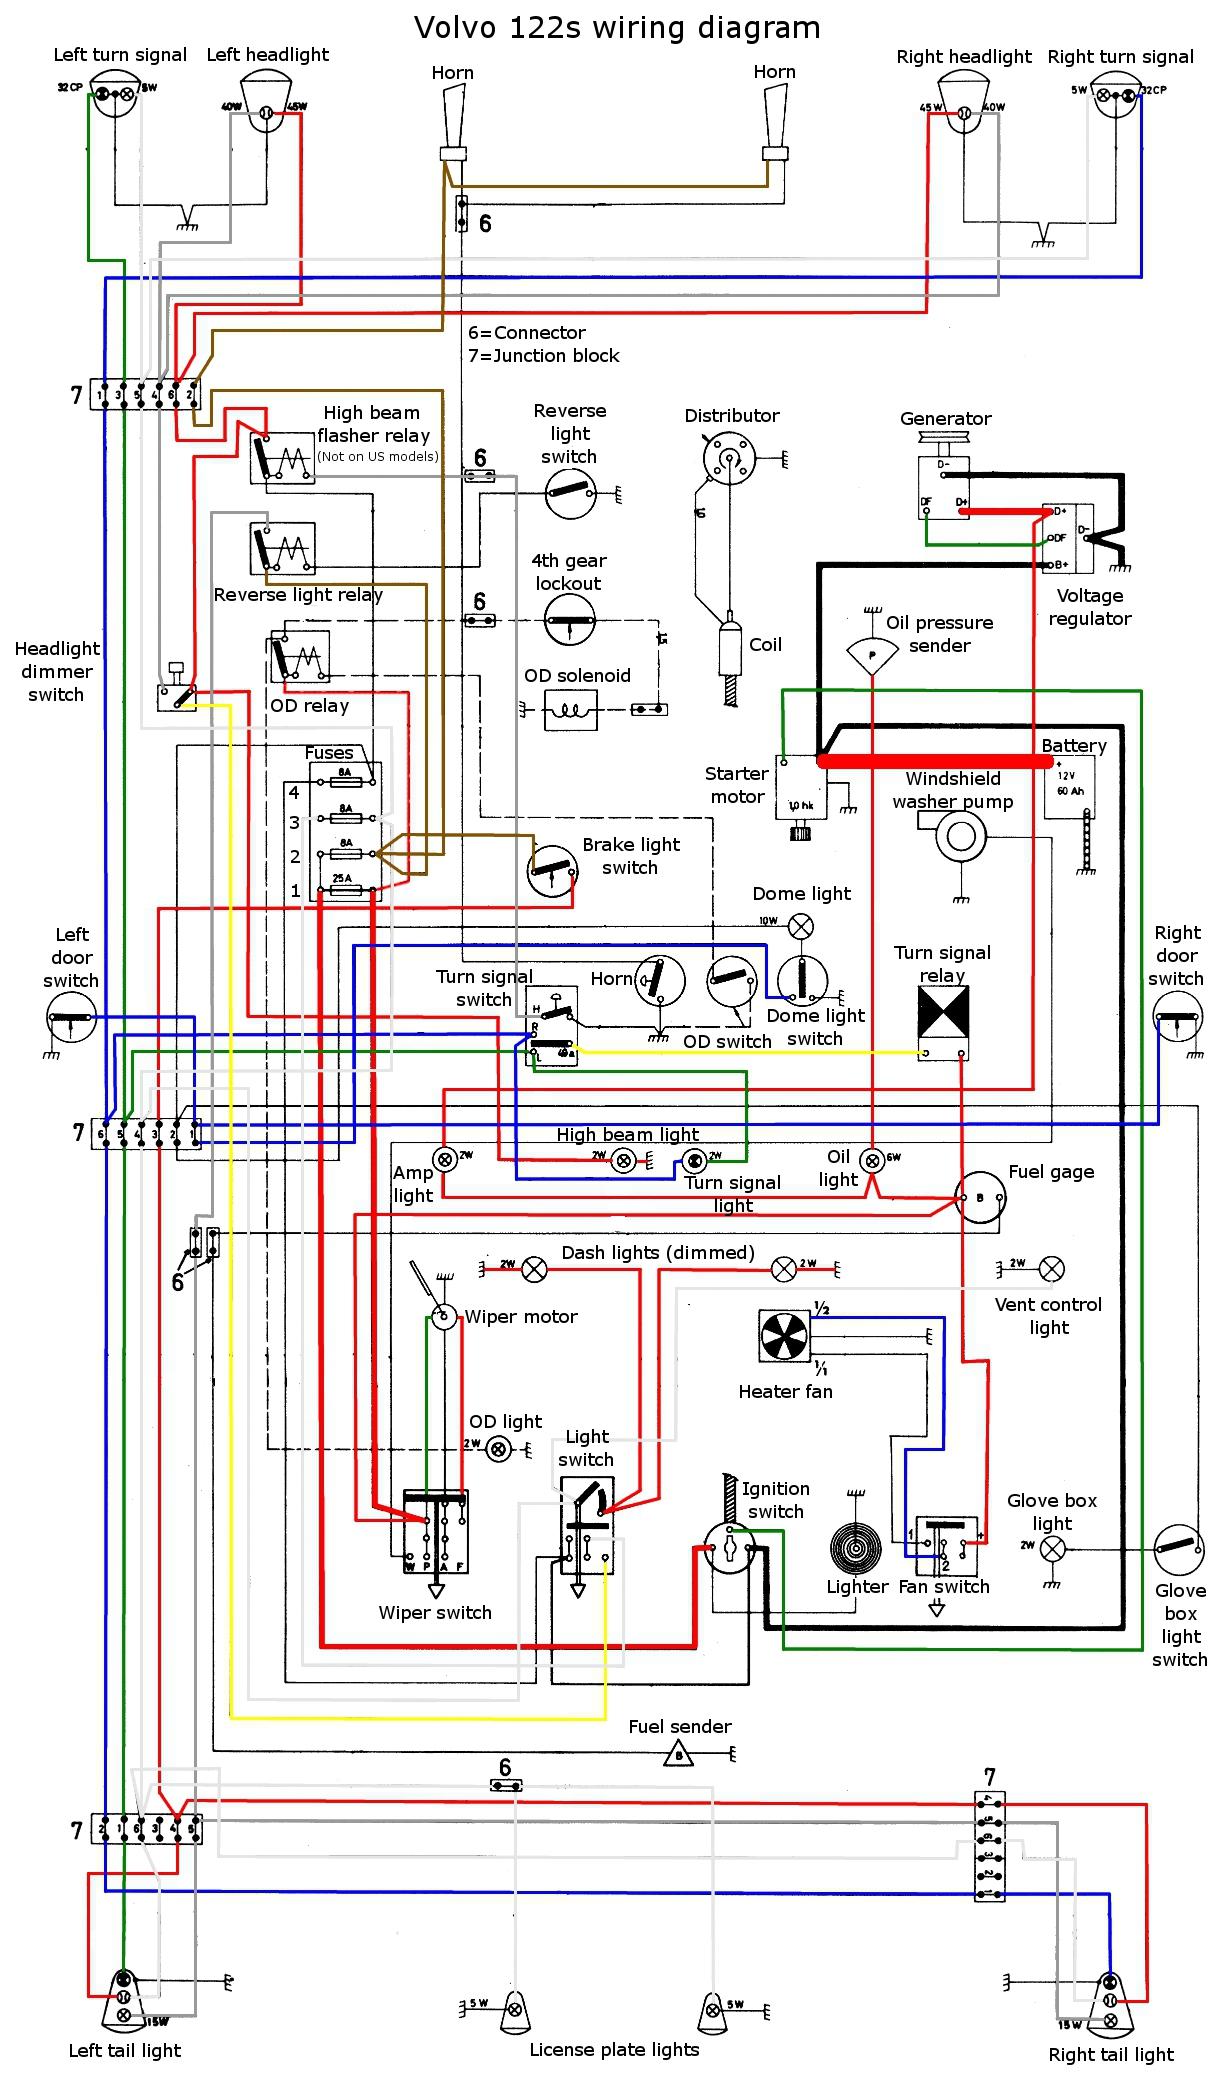 volvo t5 wiring diagram wiring diagram datavolvo s60 engine spark wiring diagram online wiring diagram volvo 850 t5 wiring diagram volvo t5 wiring diagram